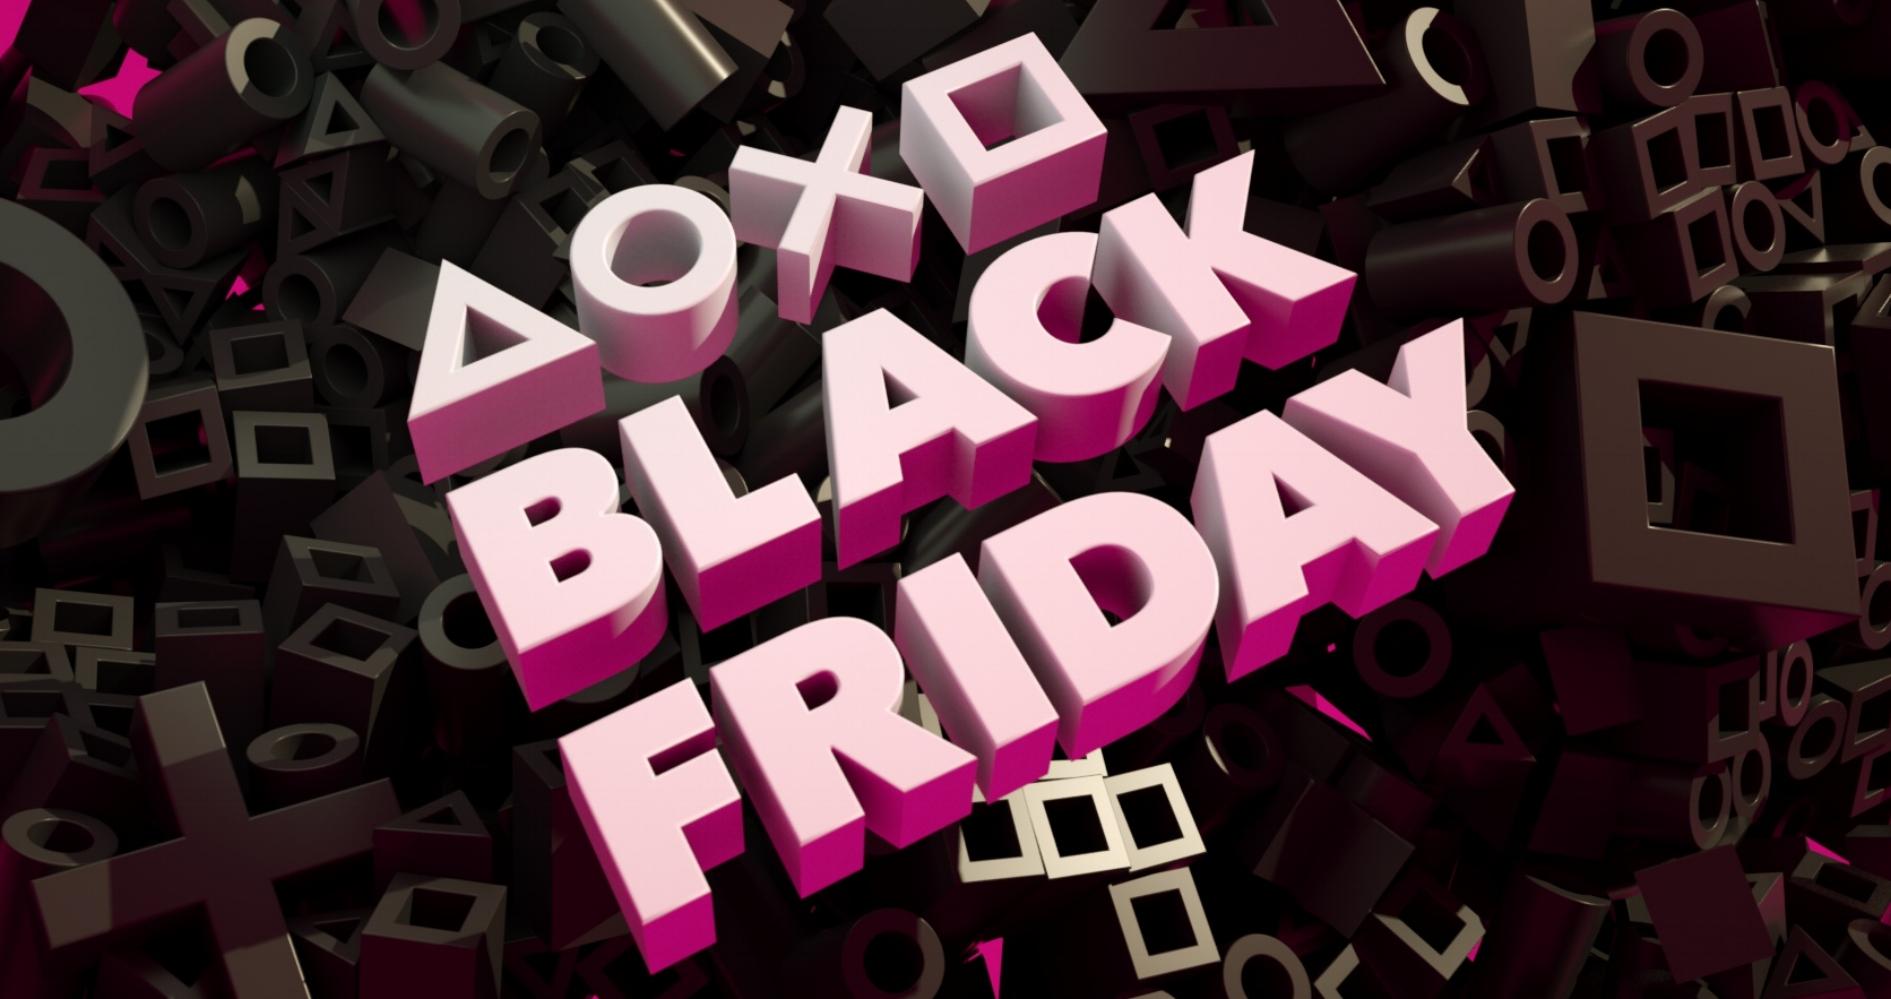 Adora Attack Mao Mini Market Playset Pink Playstation Black Friday